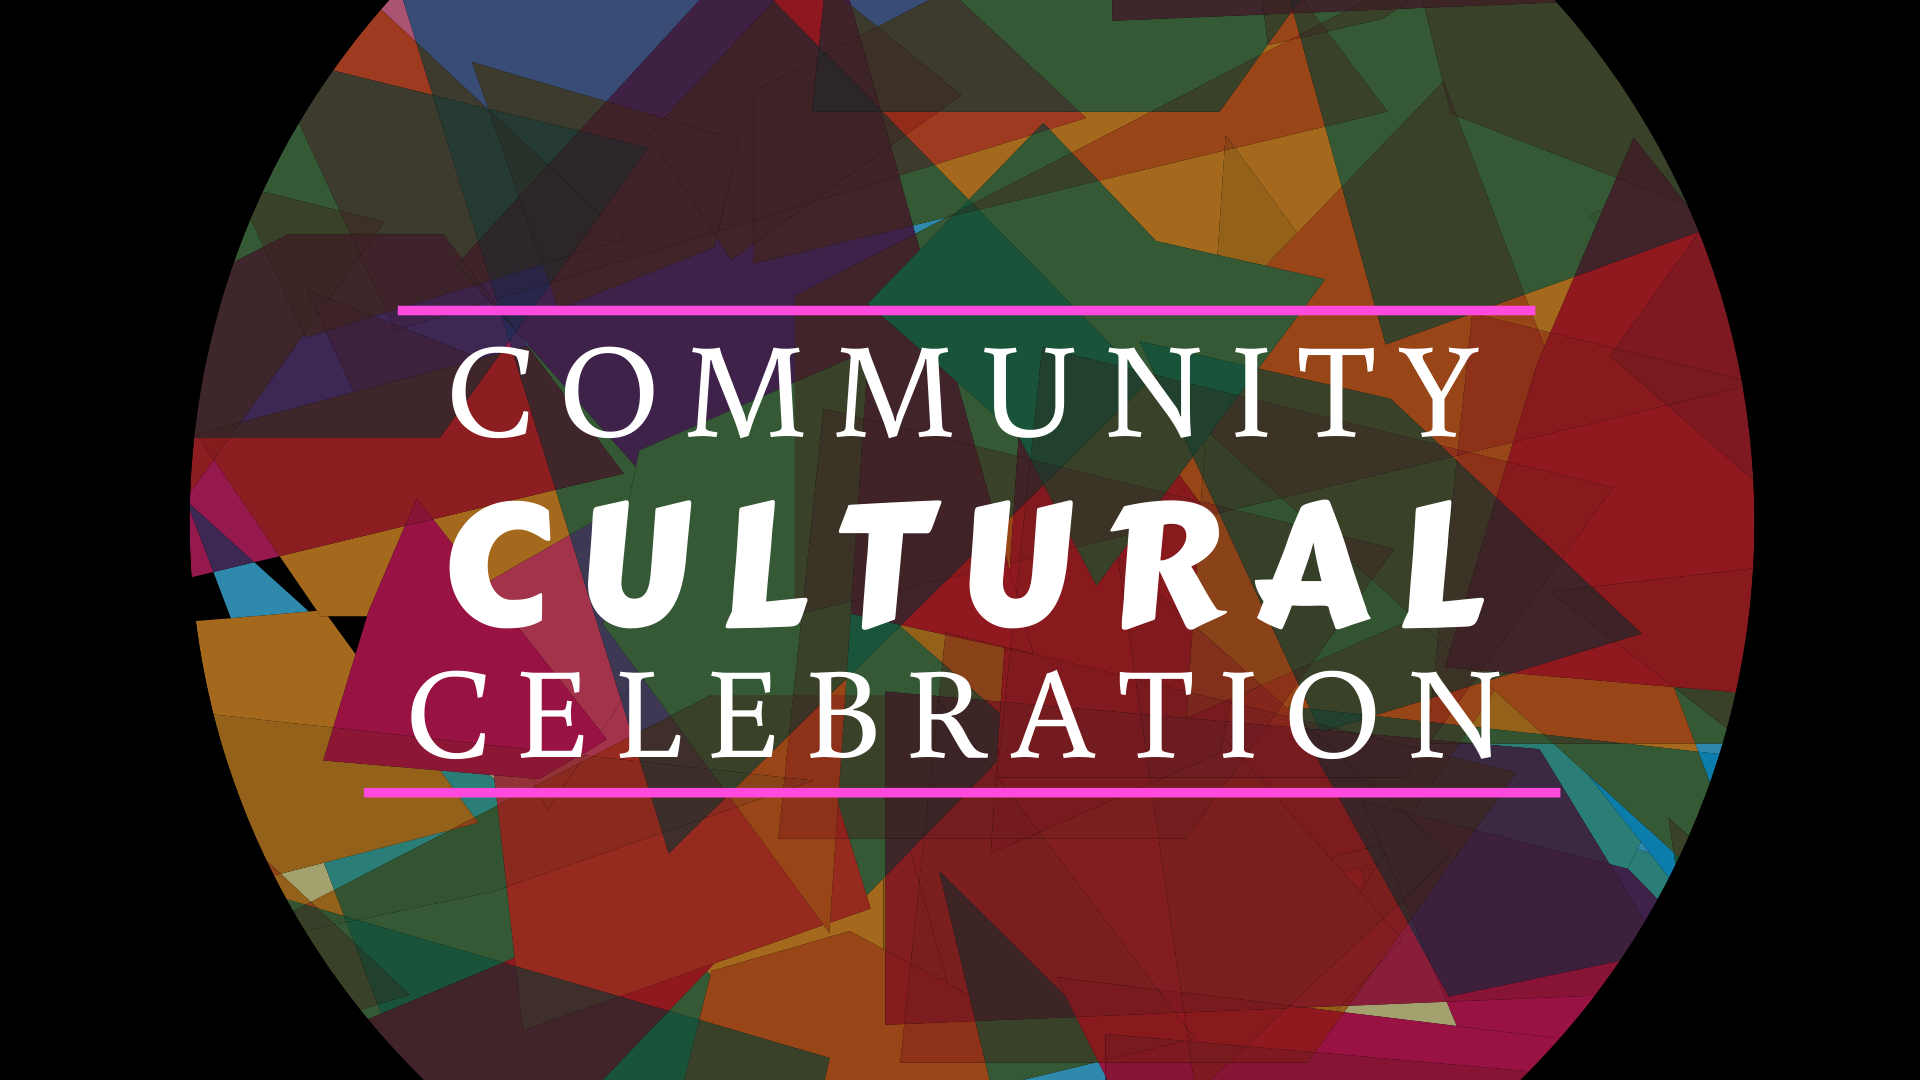 culture, cultural event, event, community culture, diversity, community event